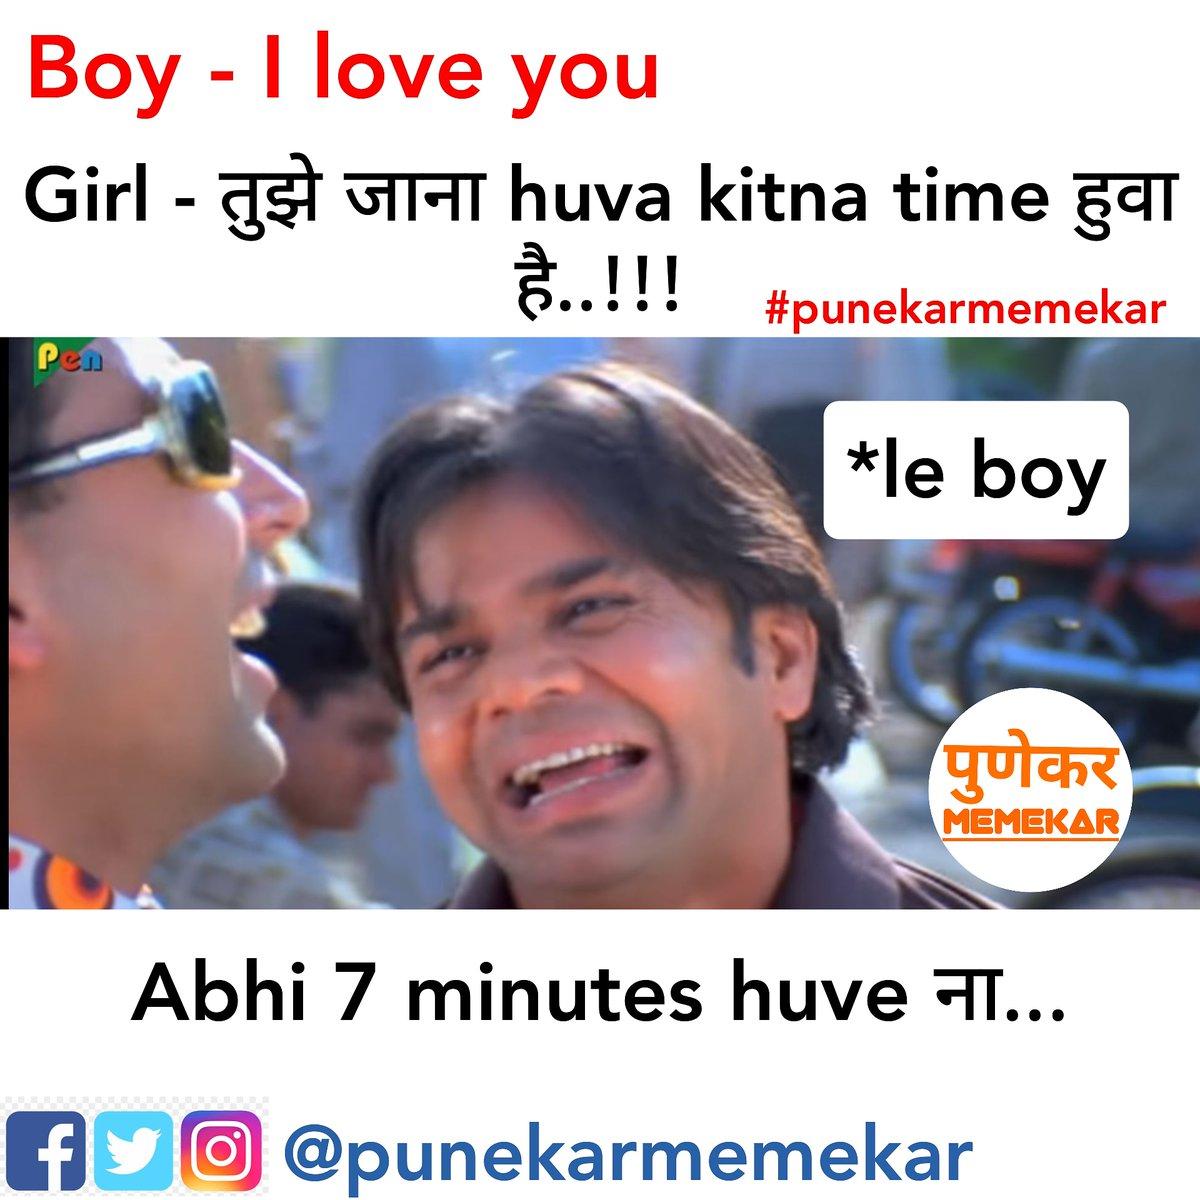 #maharashtra #marathicomedy  #mumbai #punekarmemekar #pune #nibba #phirherapherimemes #akshaykumar #phirherapheri  #viral #nustaharamkhor #rvcjmaharashtra #gavthivines #marathimulgi #marathimulga #memesdaily #lovememes #marathifunny #marathijokes #marathitroll  #marathimemepic.twitter.com/MzFkMqcybf